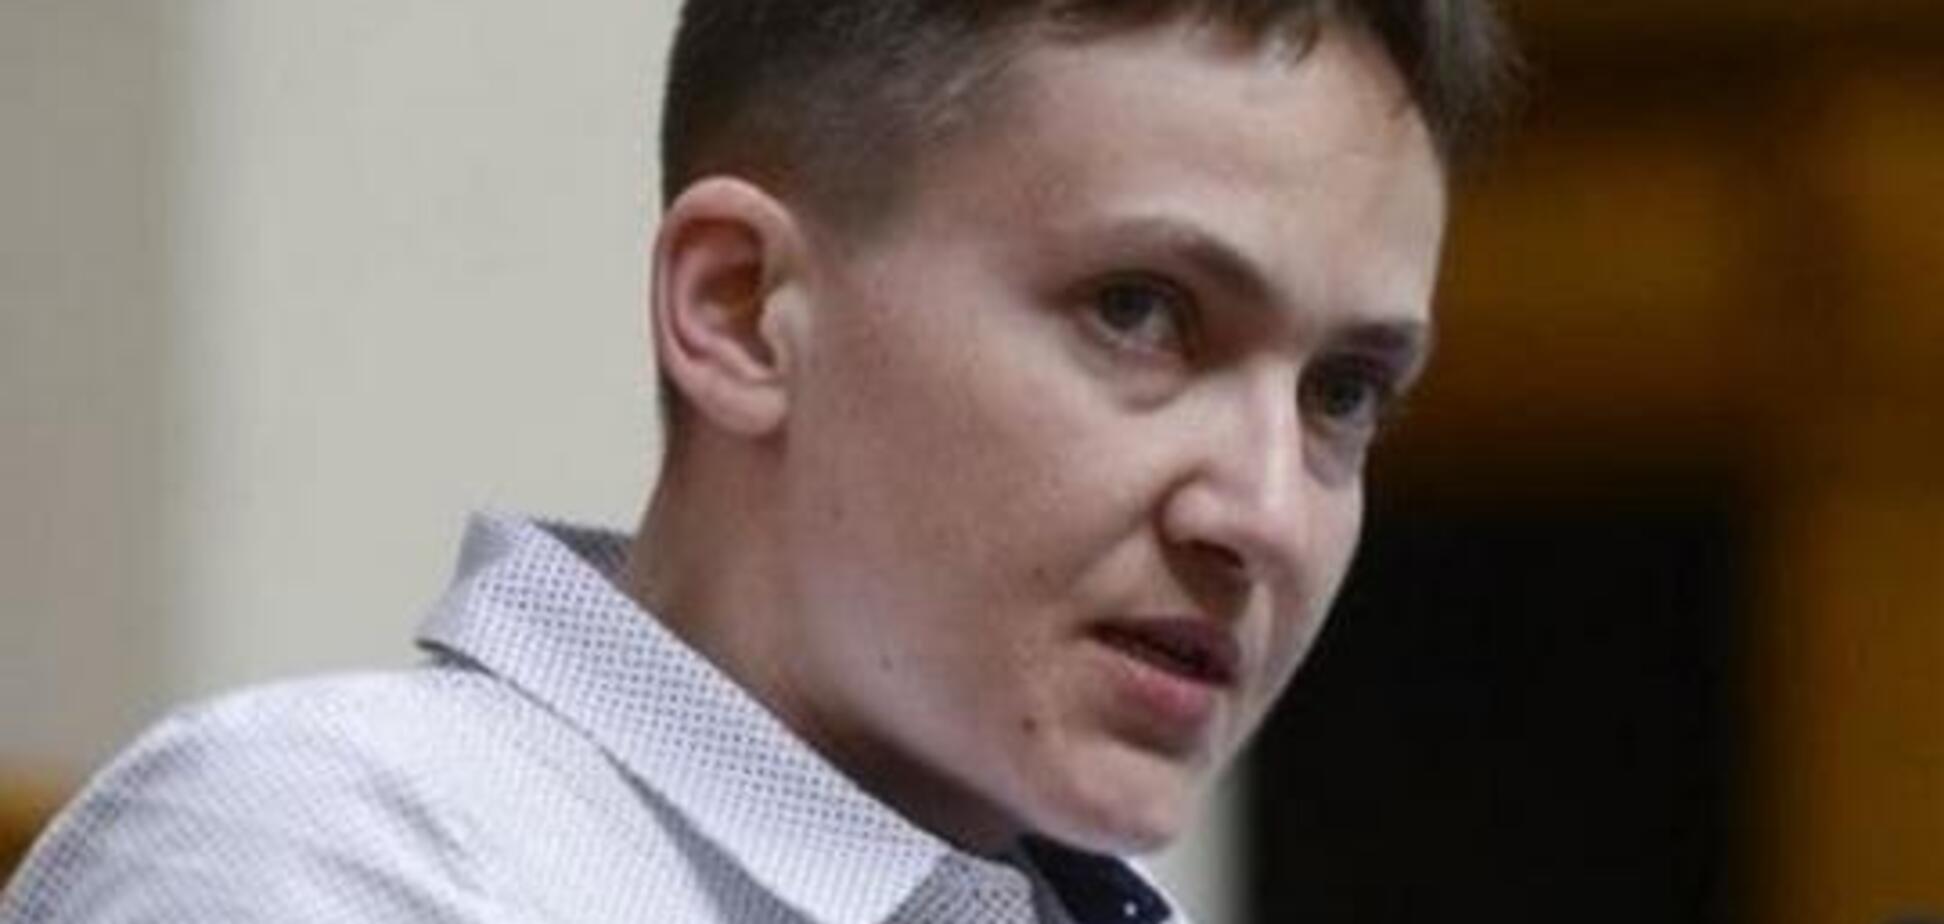 'Российская консерва': в Комитете по нацбезопасности предложили наказать Савченко